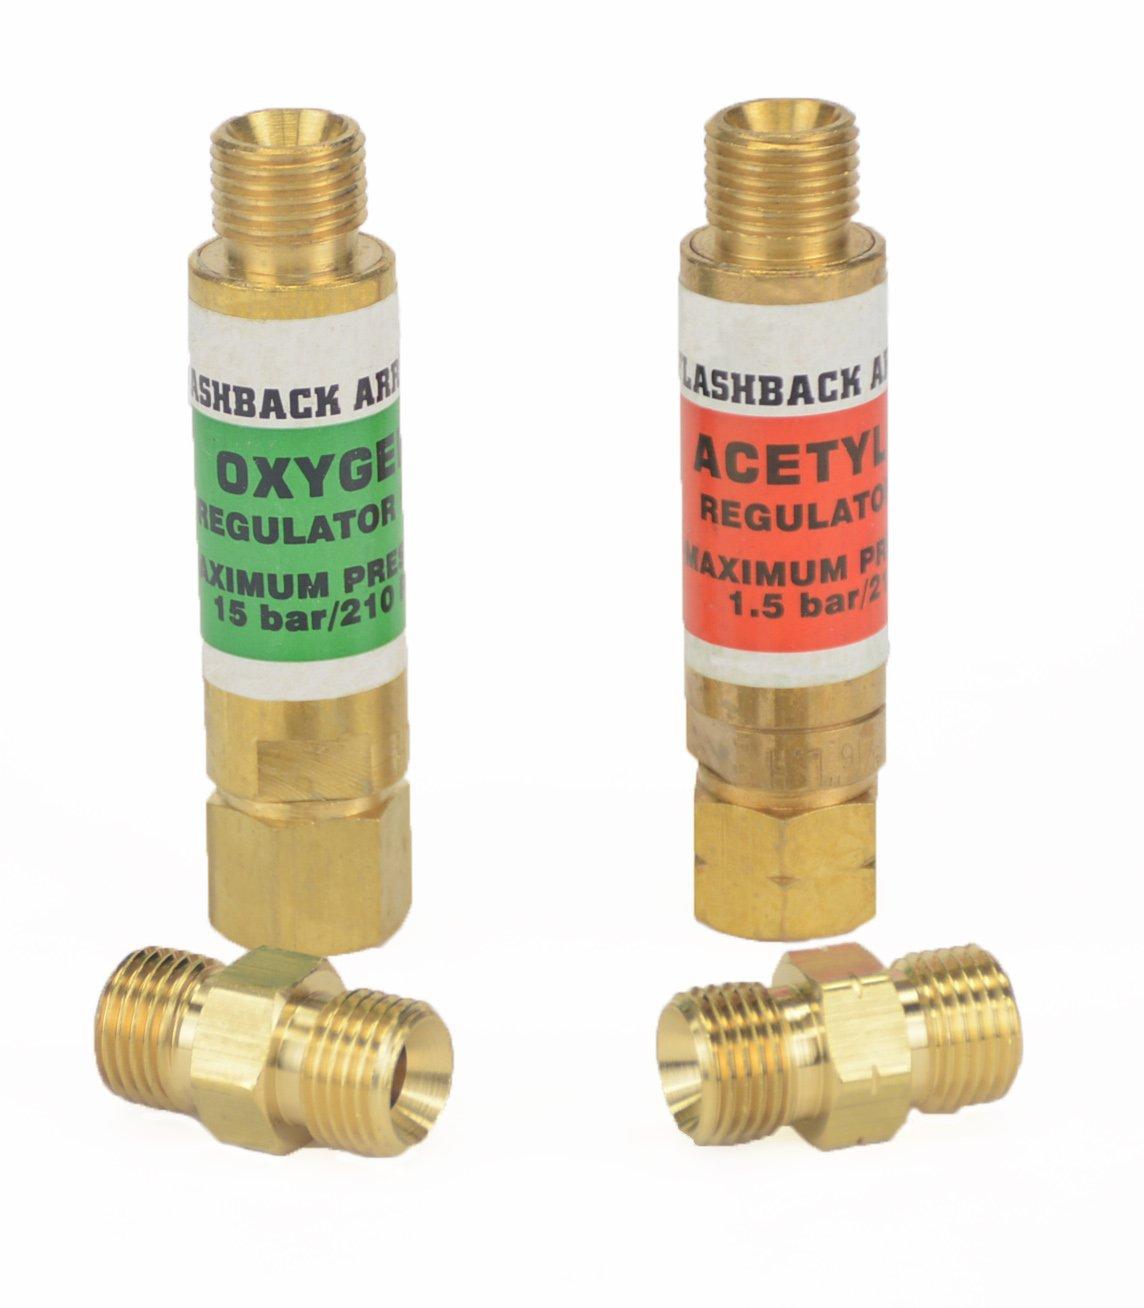 Hot Max 24010/24131 Regulator End Flashback Arrestor Set and Oxy-Acetylene Twin Hose Coupler/Union Bundle